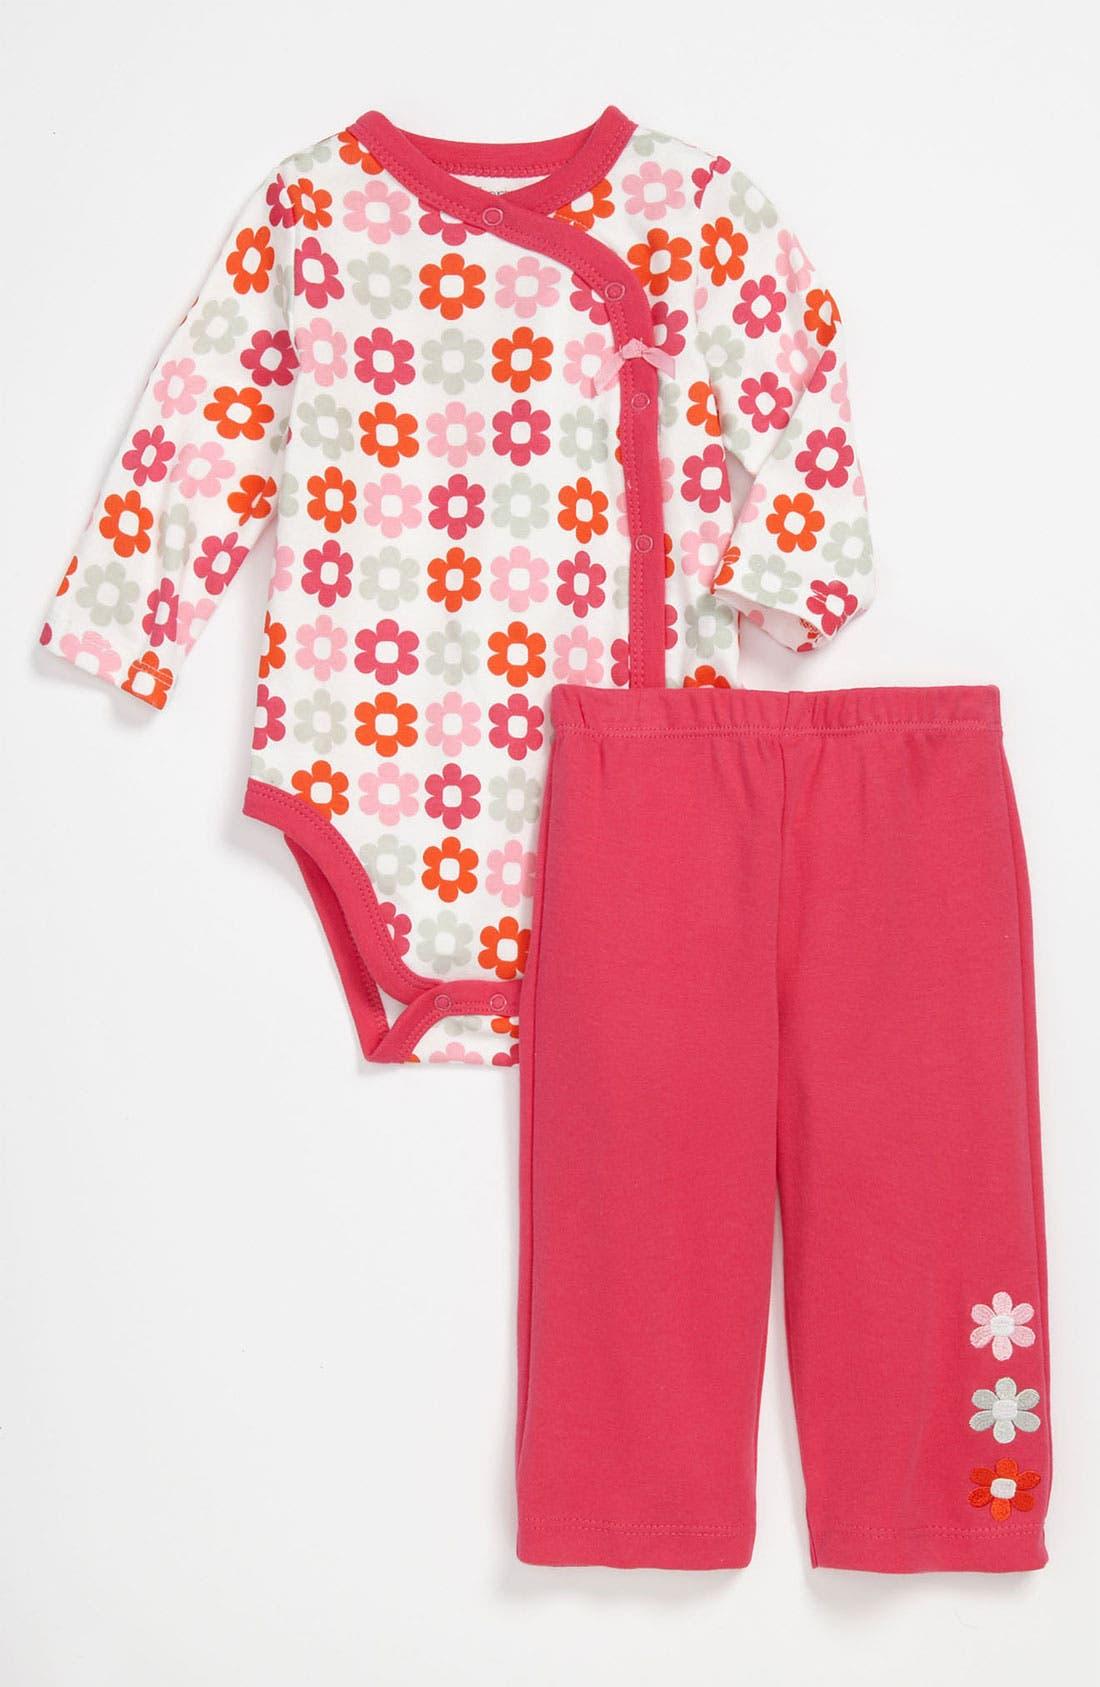 Main Image - Offspring 'Daisy' Bodysuit & Pants (Infant)